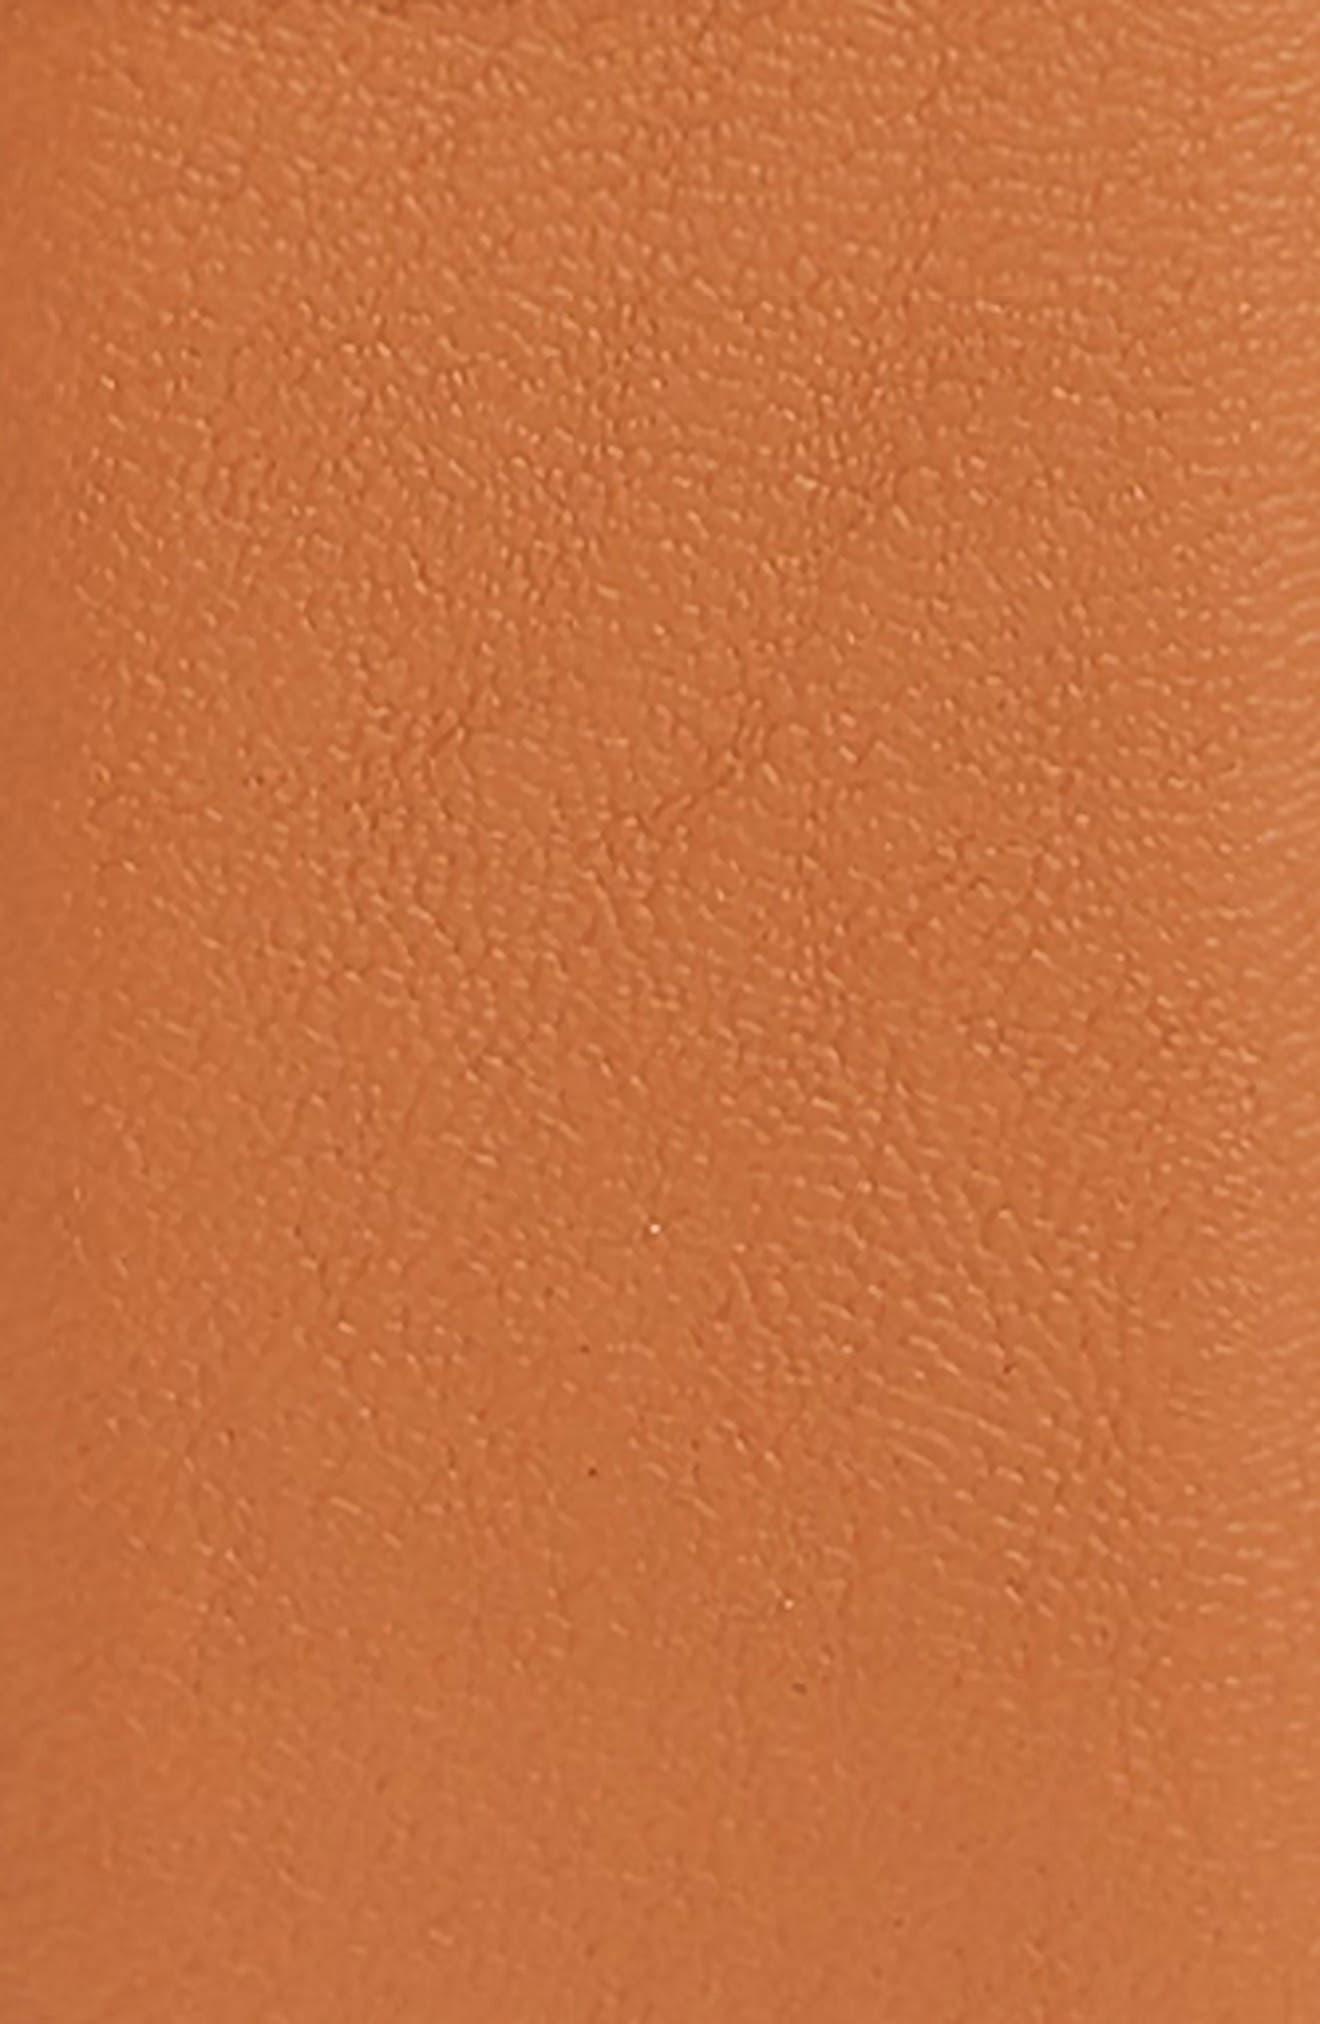 NORDSTROM, Reversible Faux Leather Belt, Alternate thumbnail 3, color, BROWN